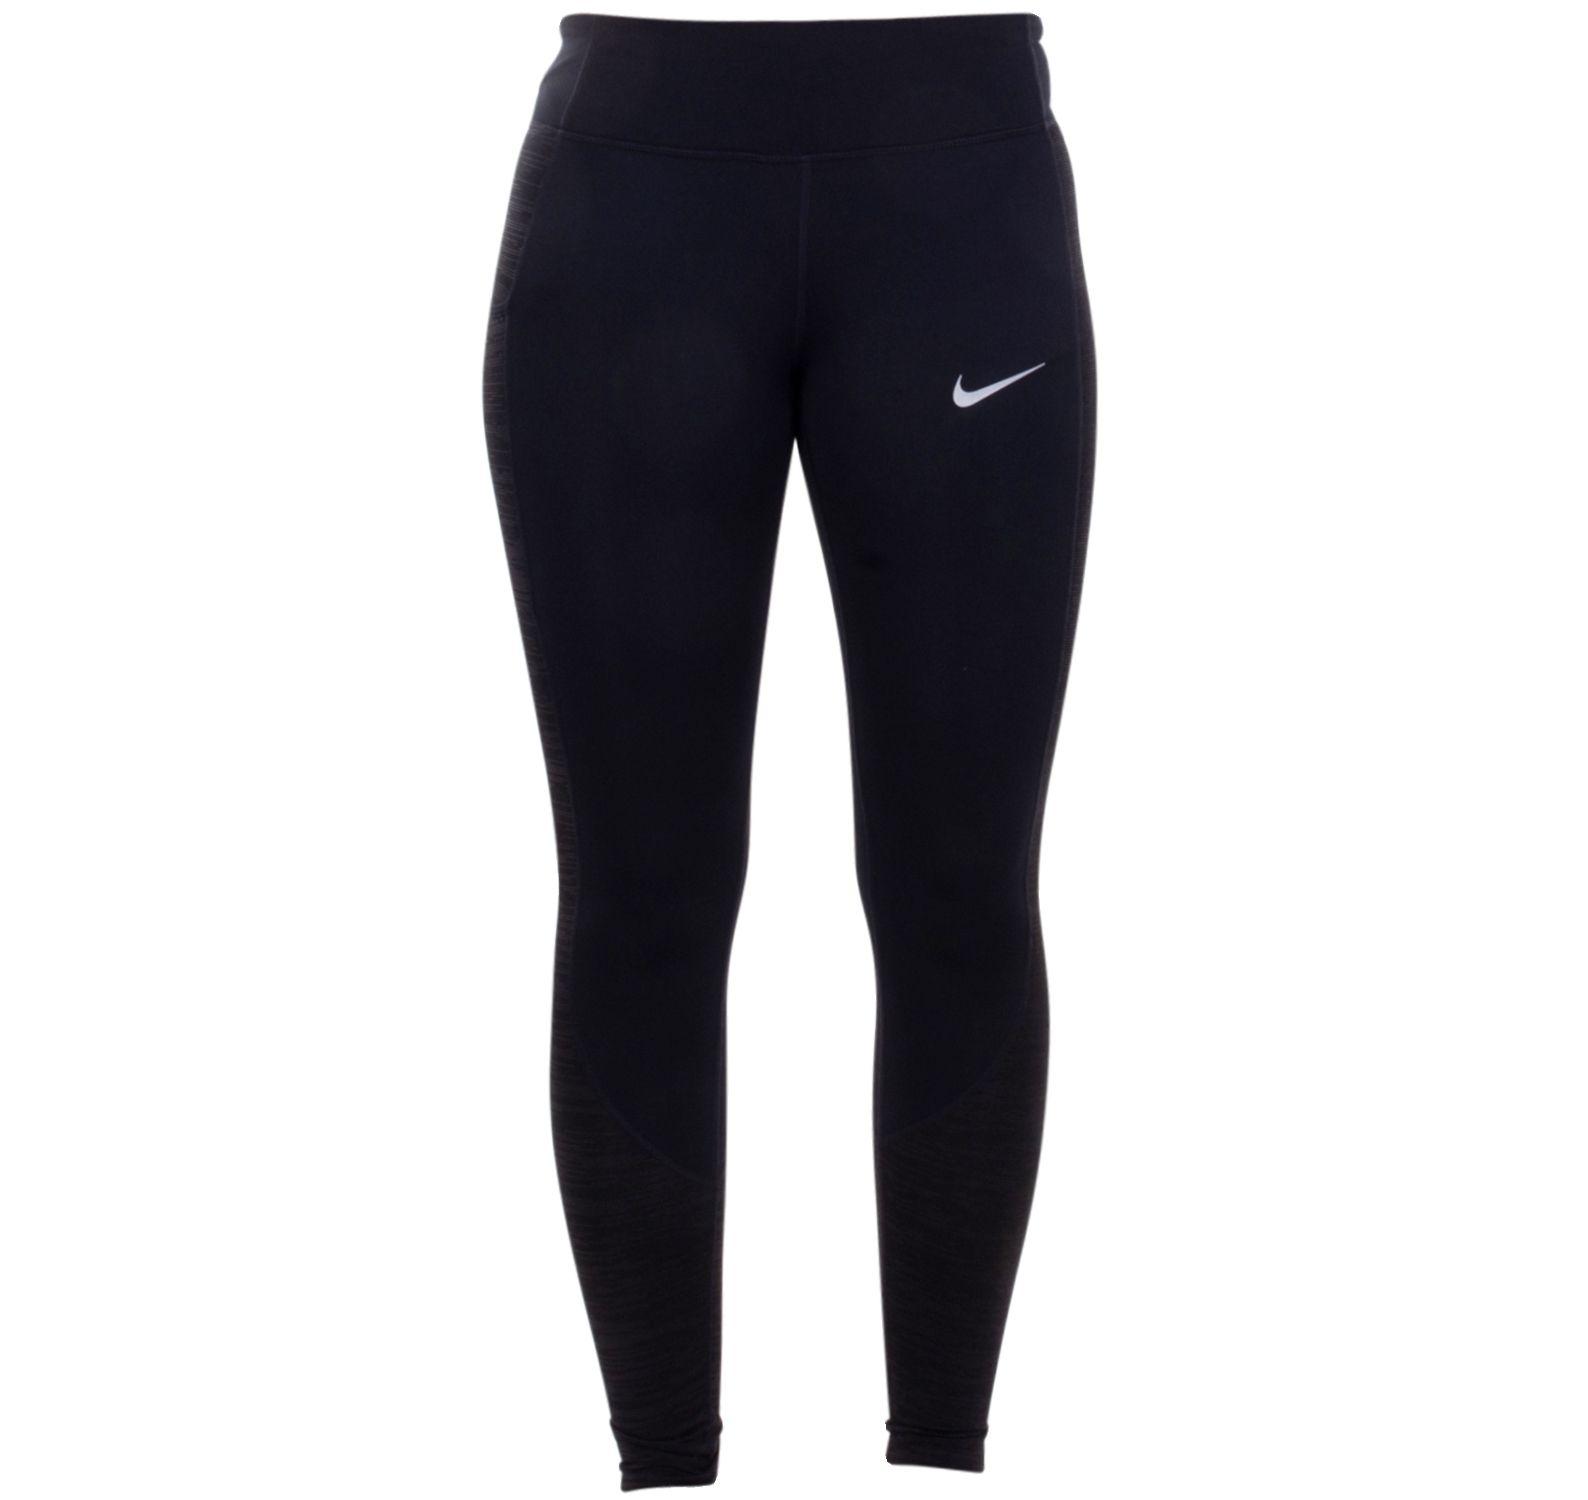 Nike Racer Women's Warm Runnin, Black/Metallic Silver, Xs,  Nike